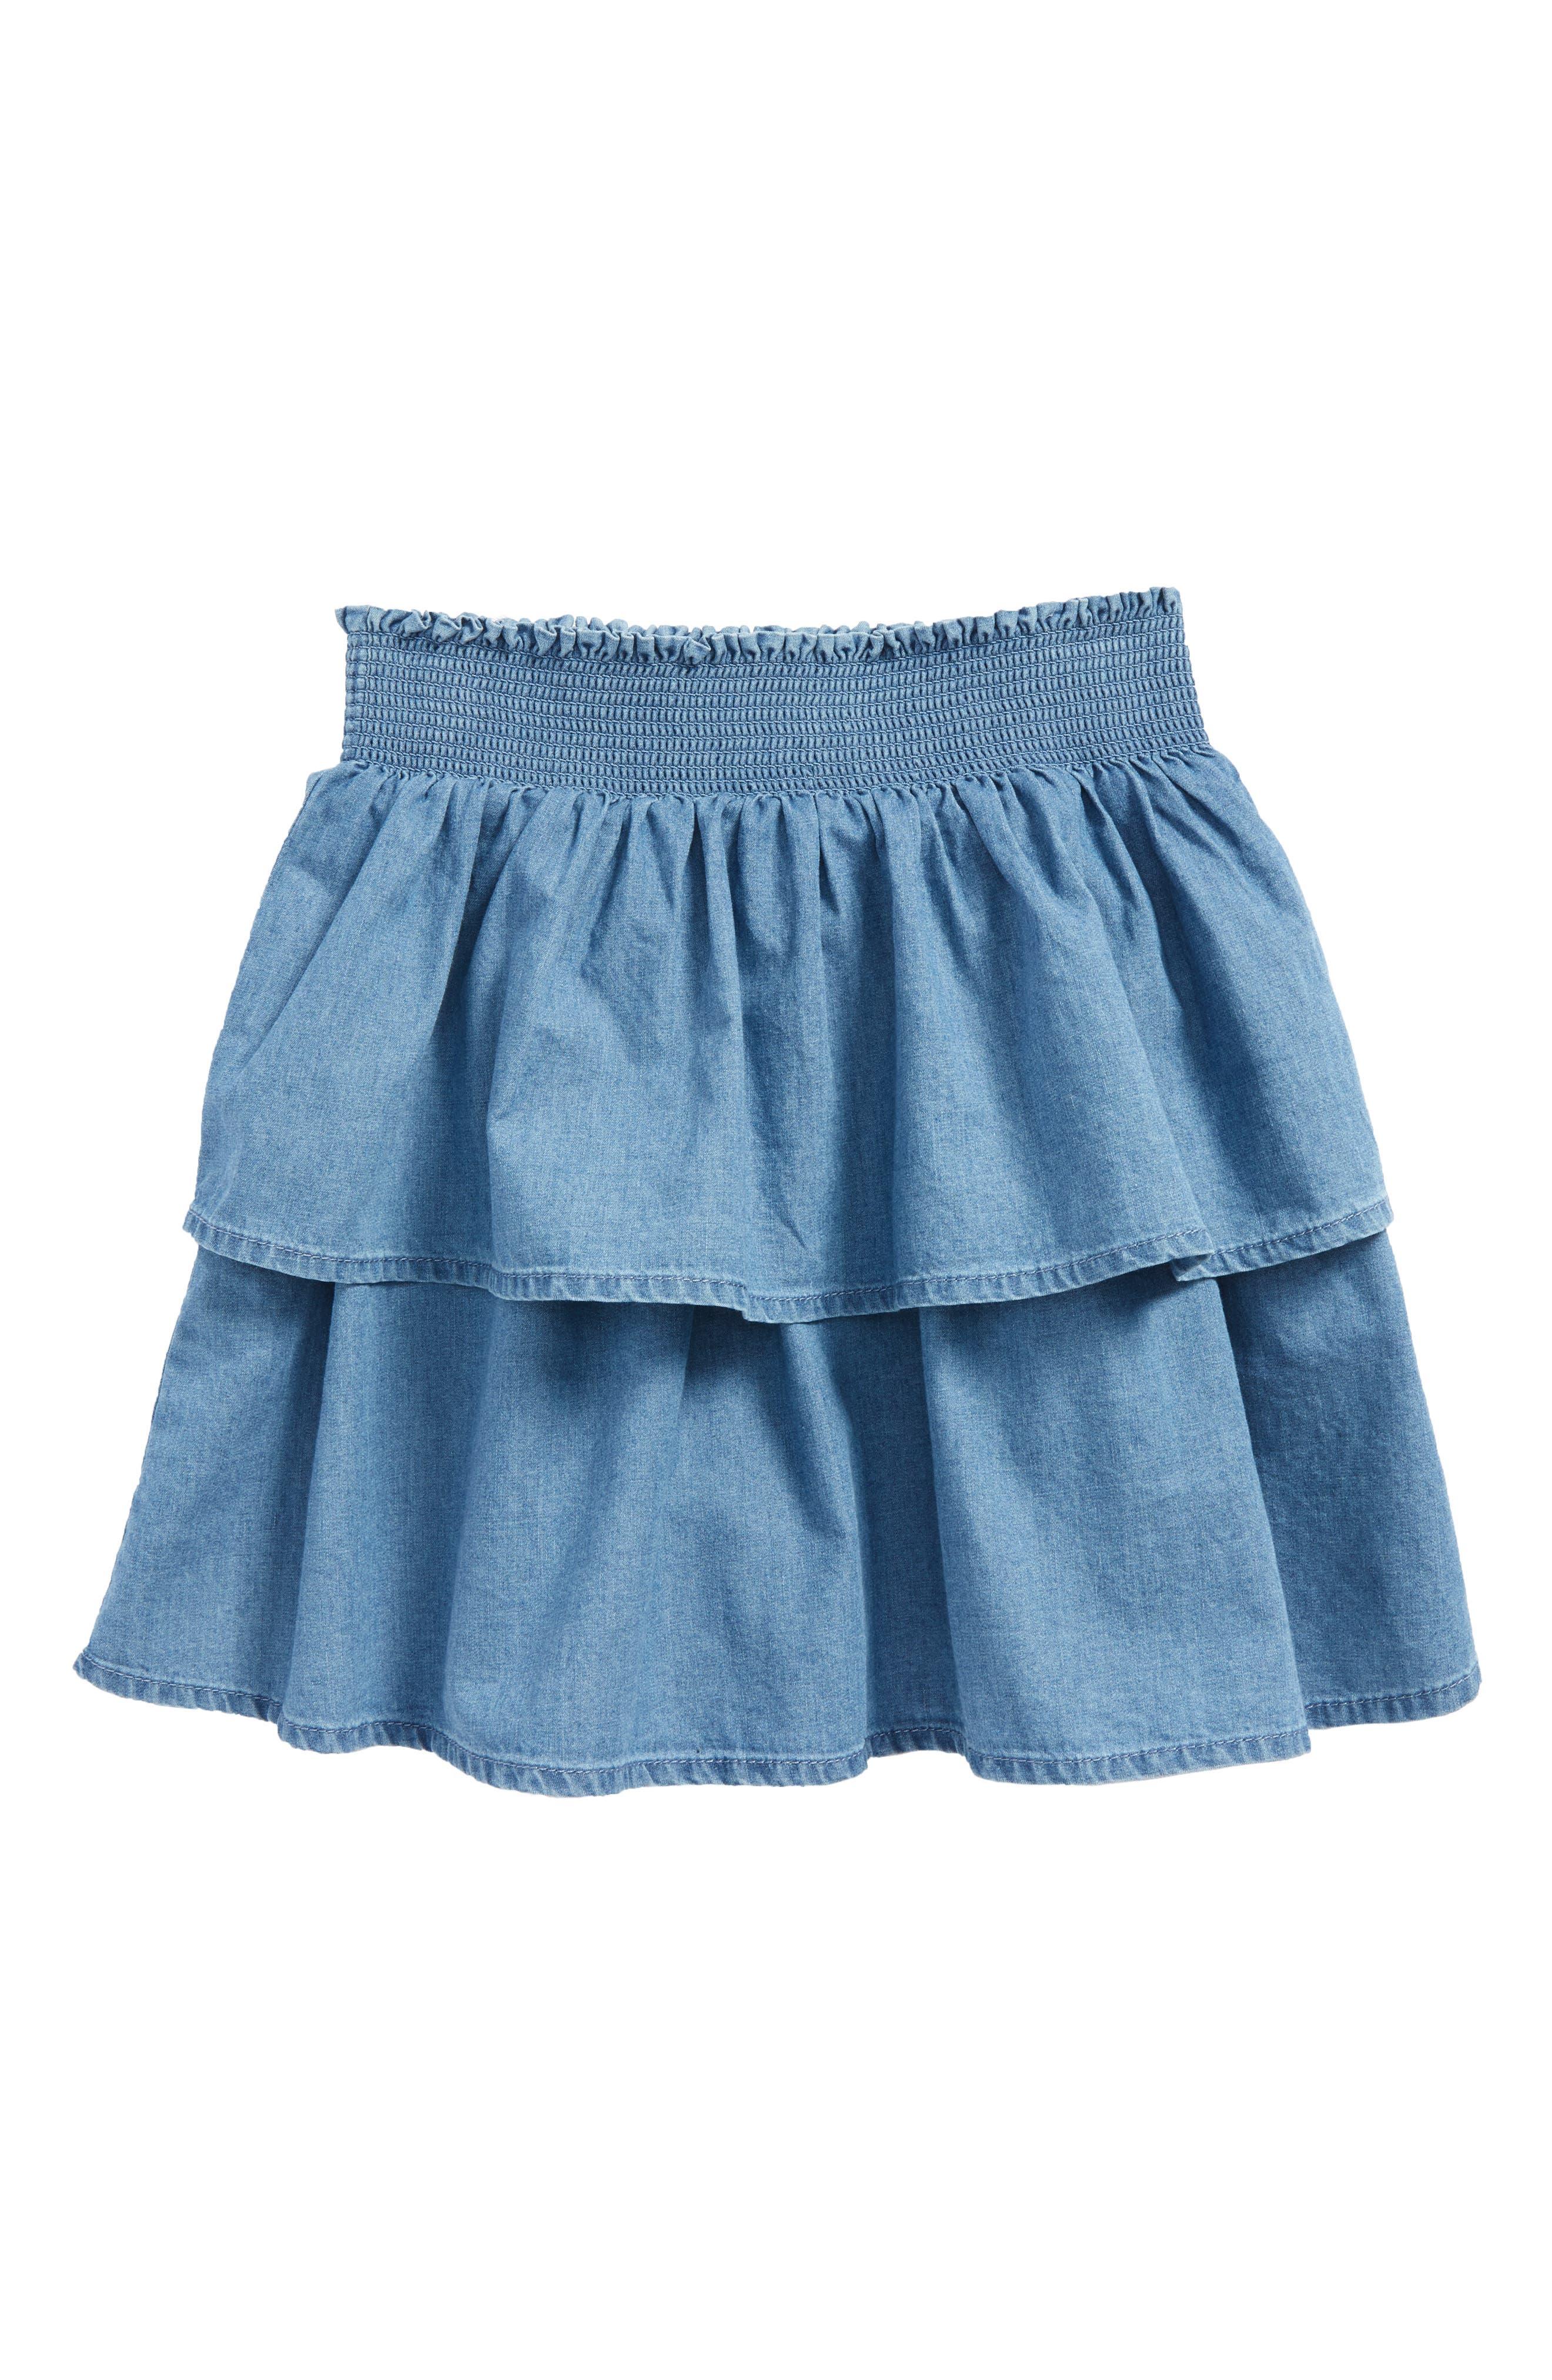 Ruffle Denim Skirt,                             Main thumbnail 1, color,                             Chambray Mch